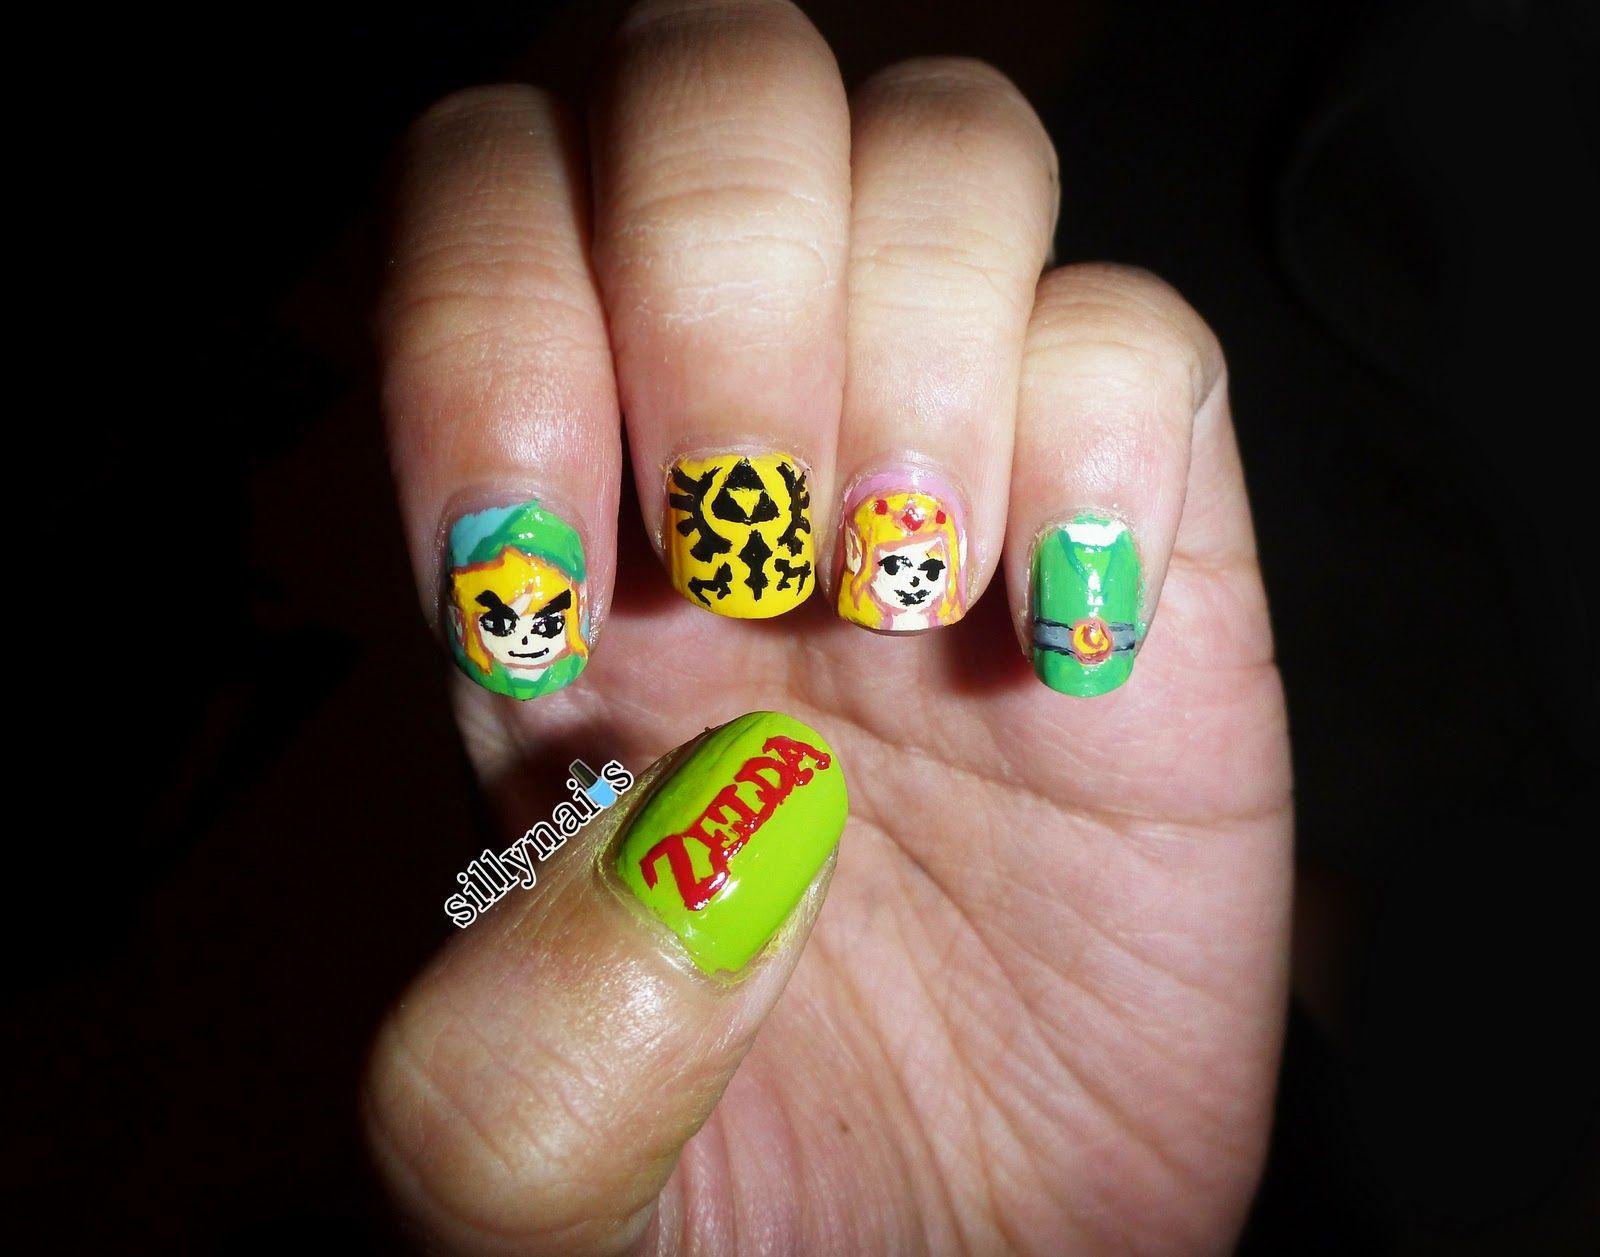 Legend Of Zelda Nail Art Gamer Nail Art Pinterest